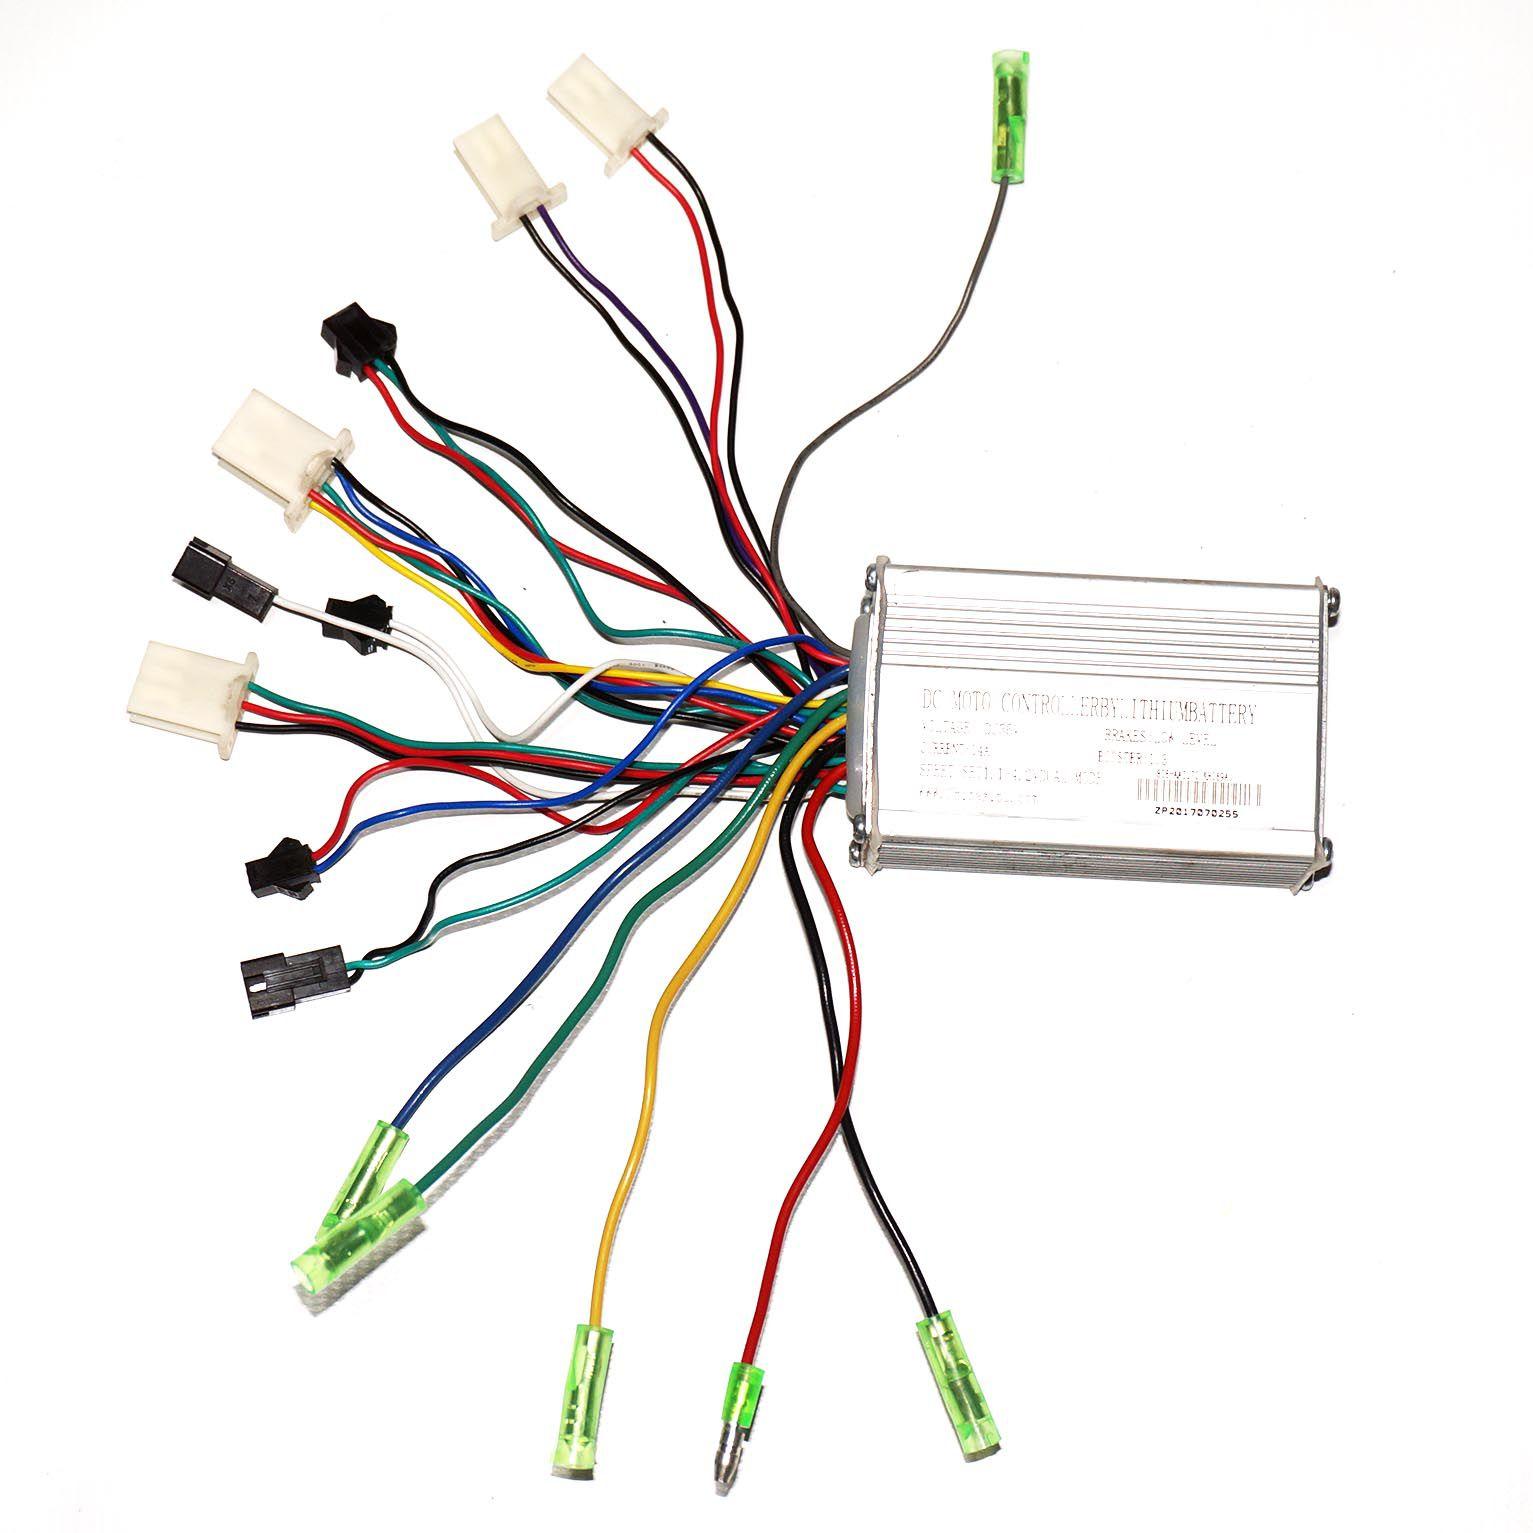 Controladora 36v p/ Painel 810 URBANA/STYLE/CLASSIC/JS 20 2017/2018/2019/2020